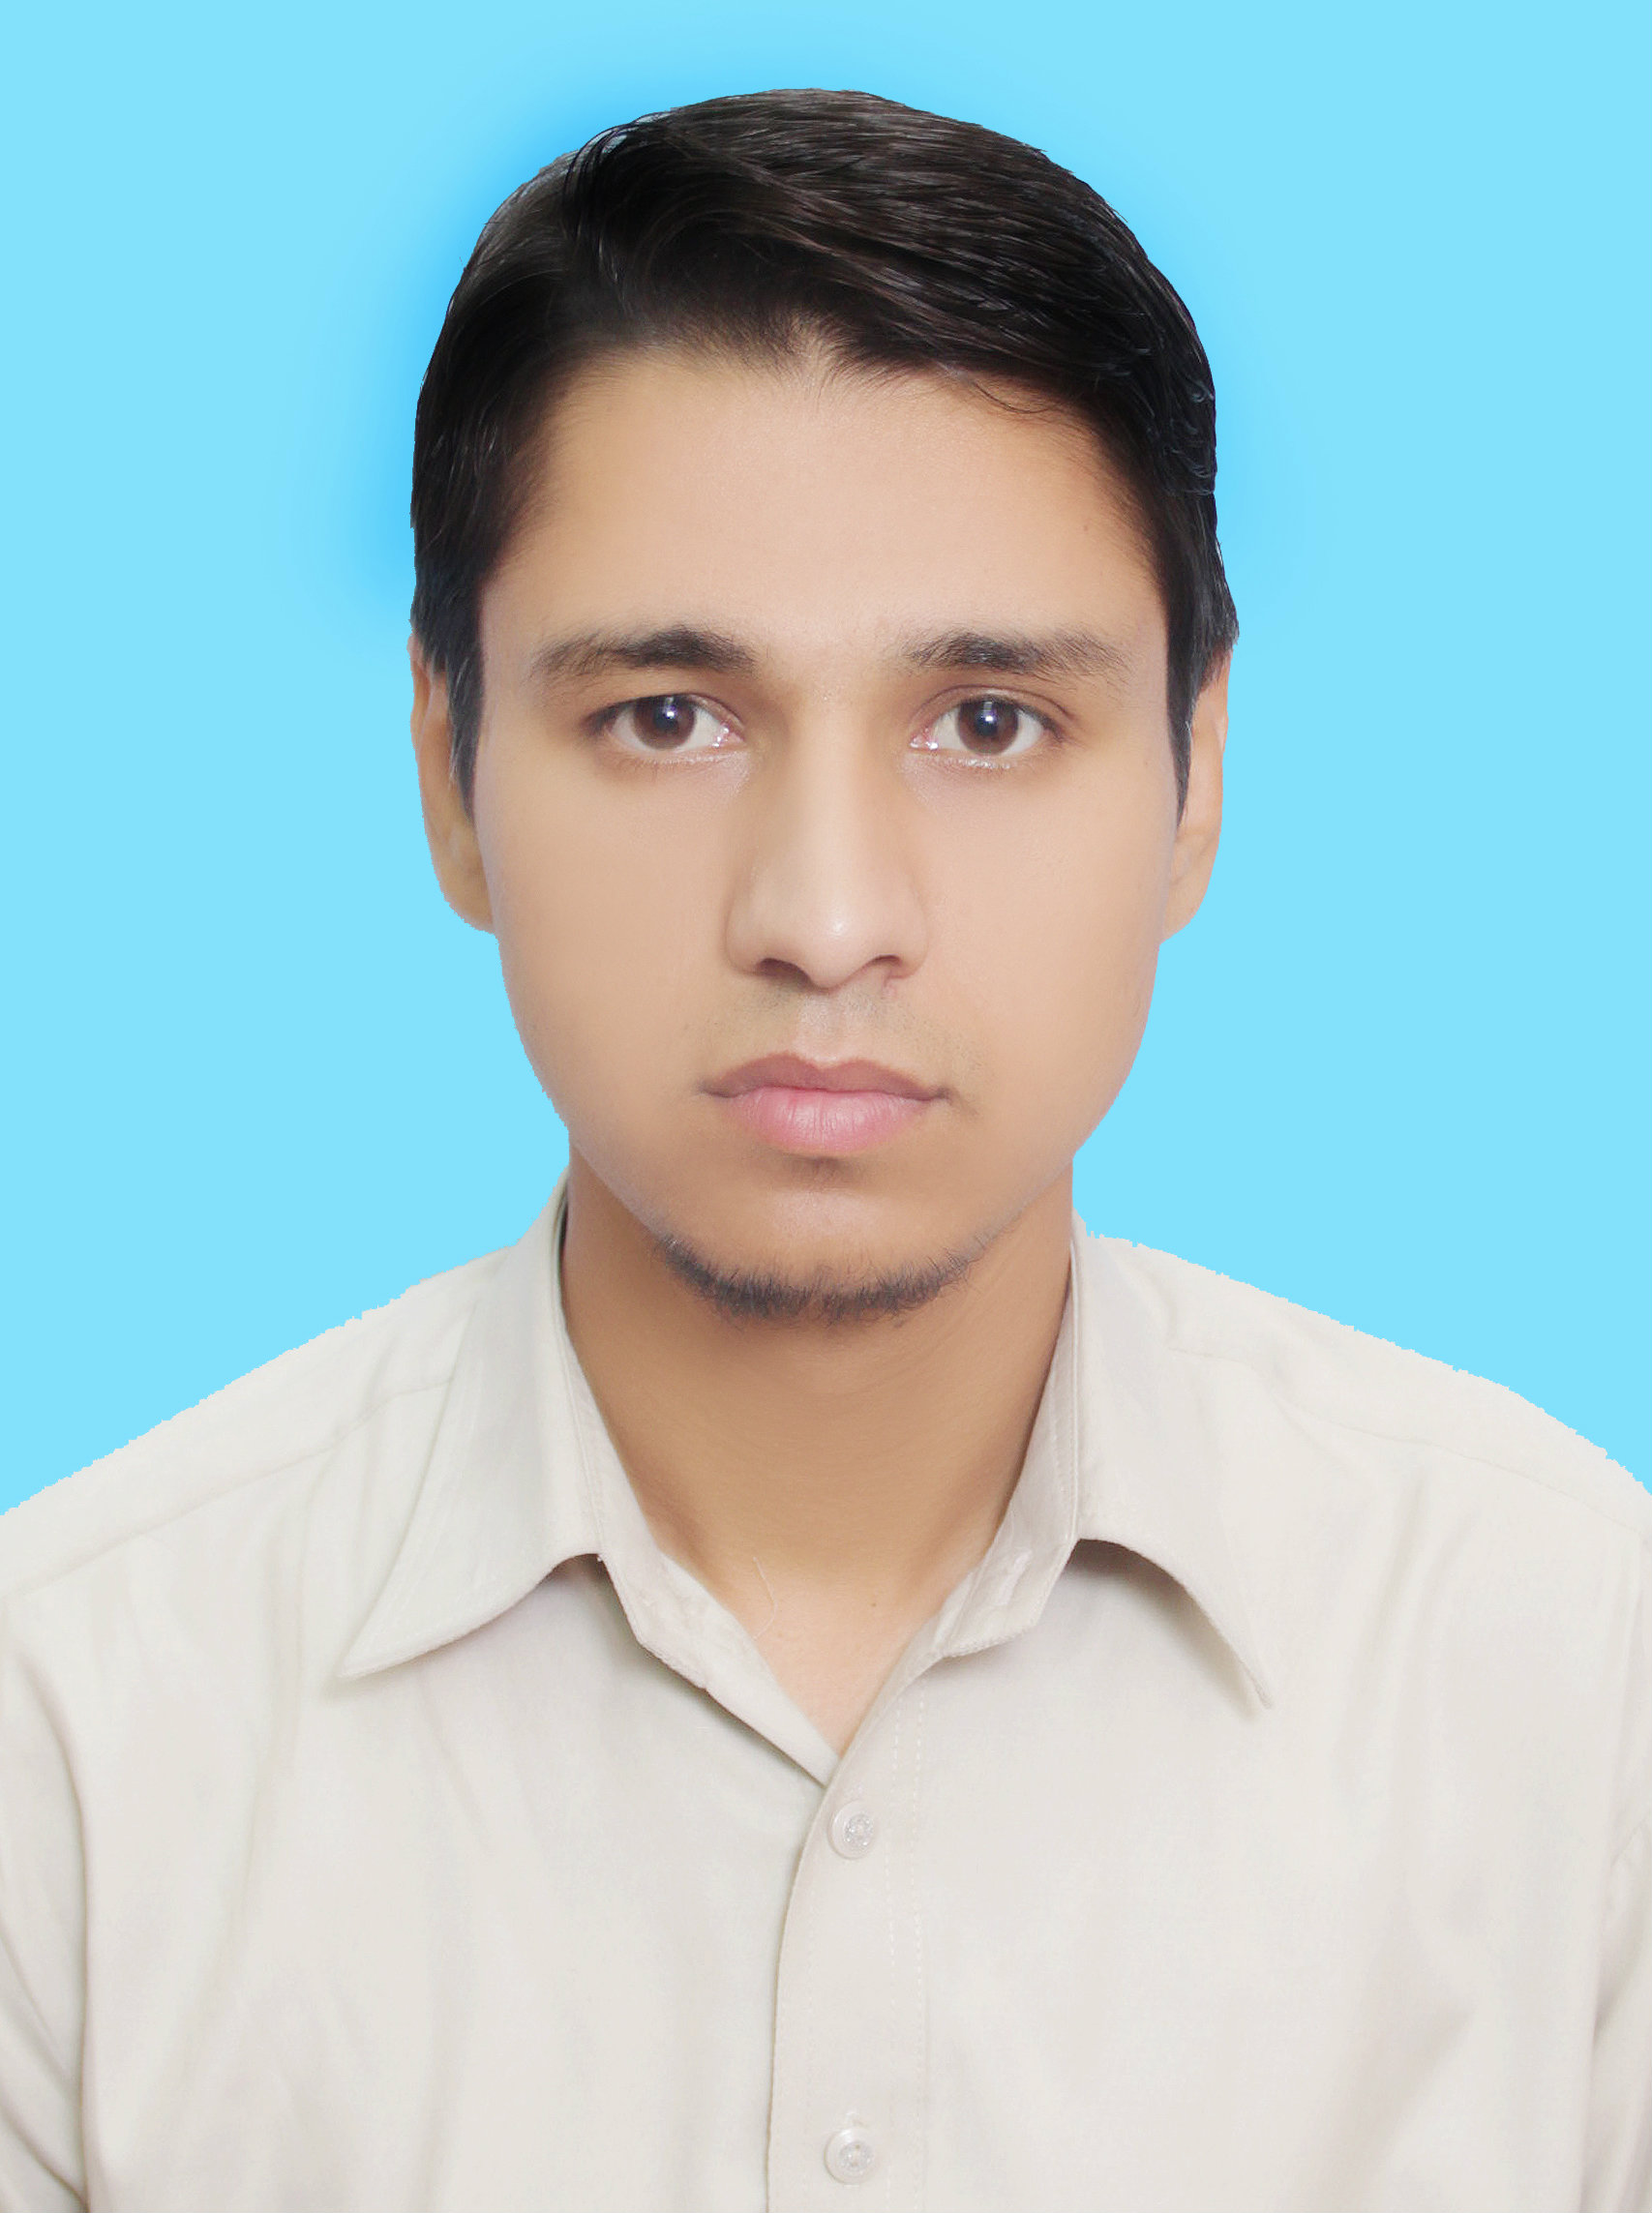 Muhammad Tahir Ayub Photoshop